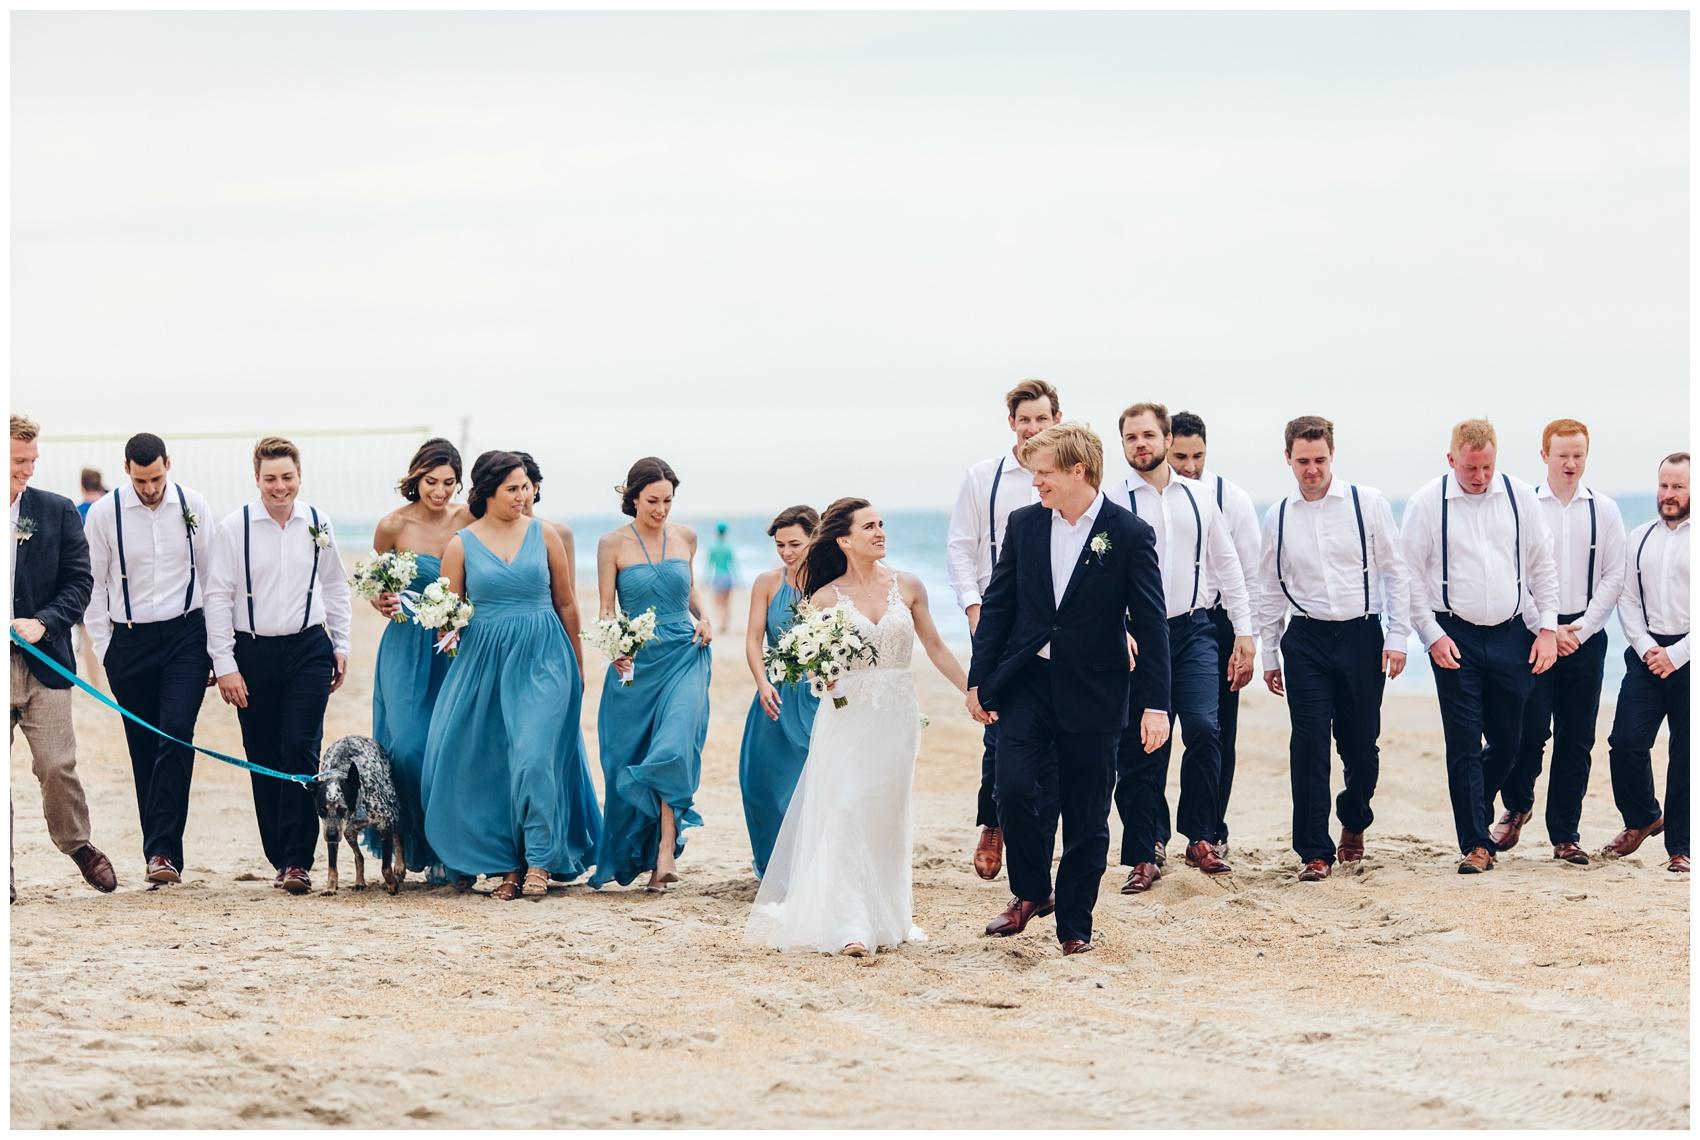 Outer-Banks-Corolla-Wedding_0076.jpg